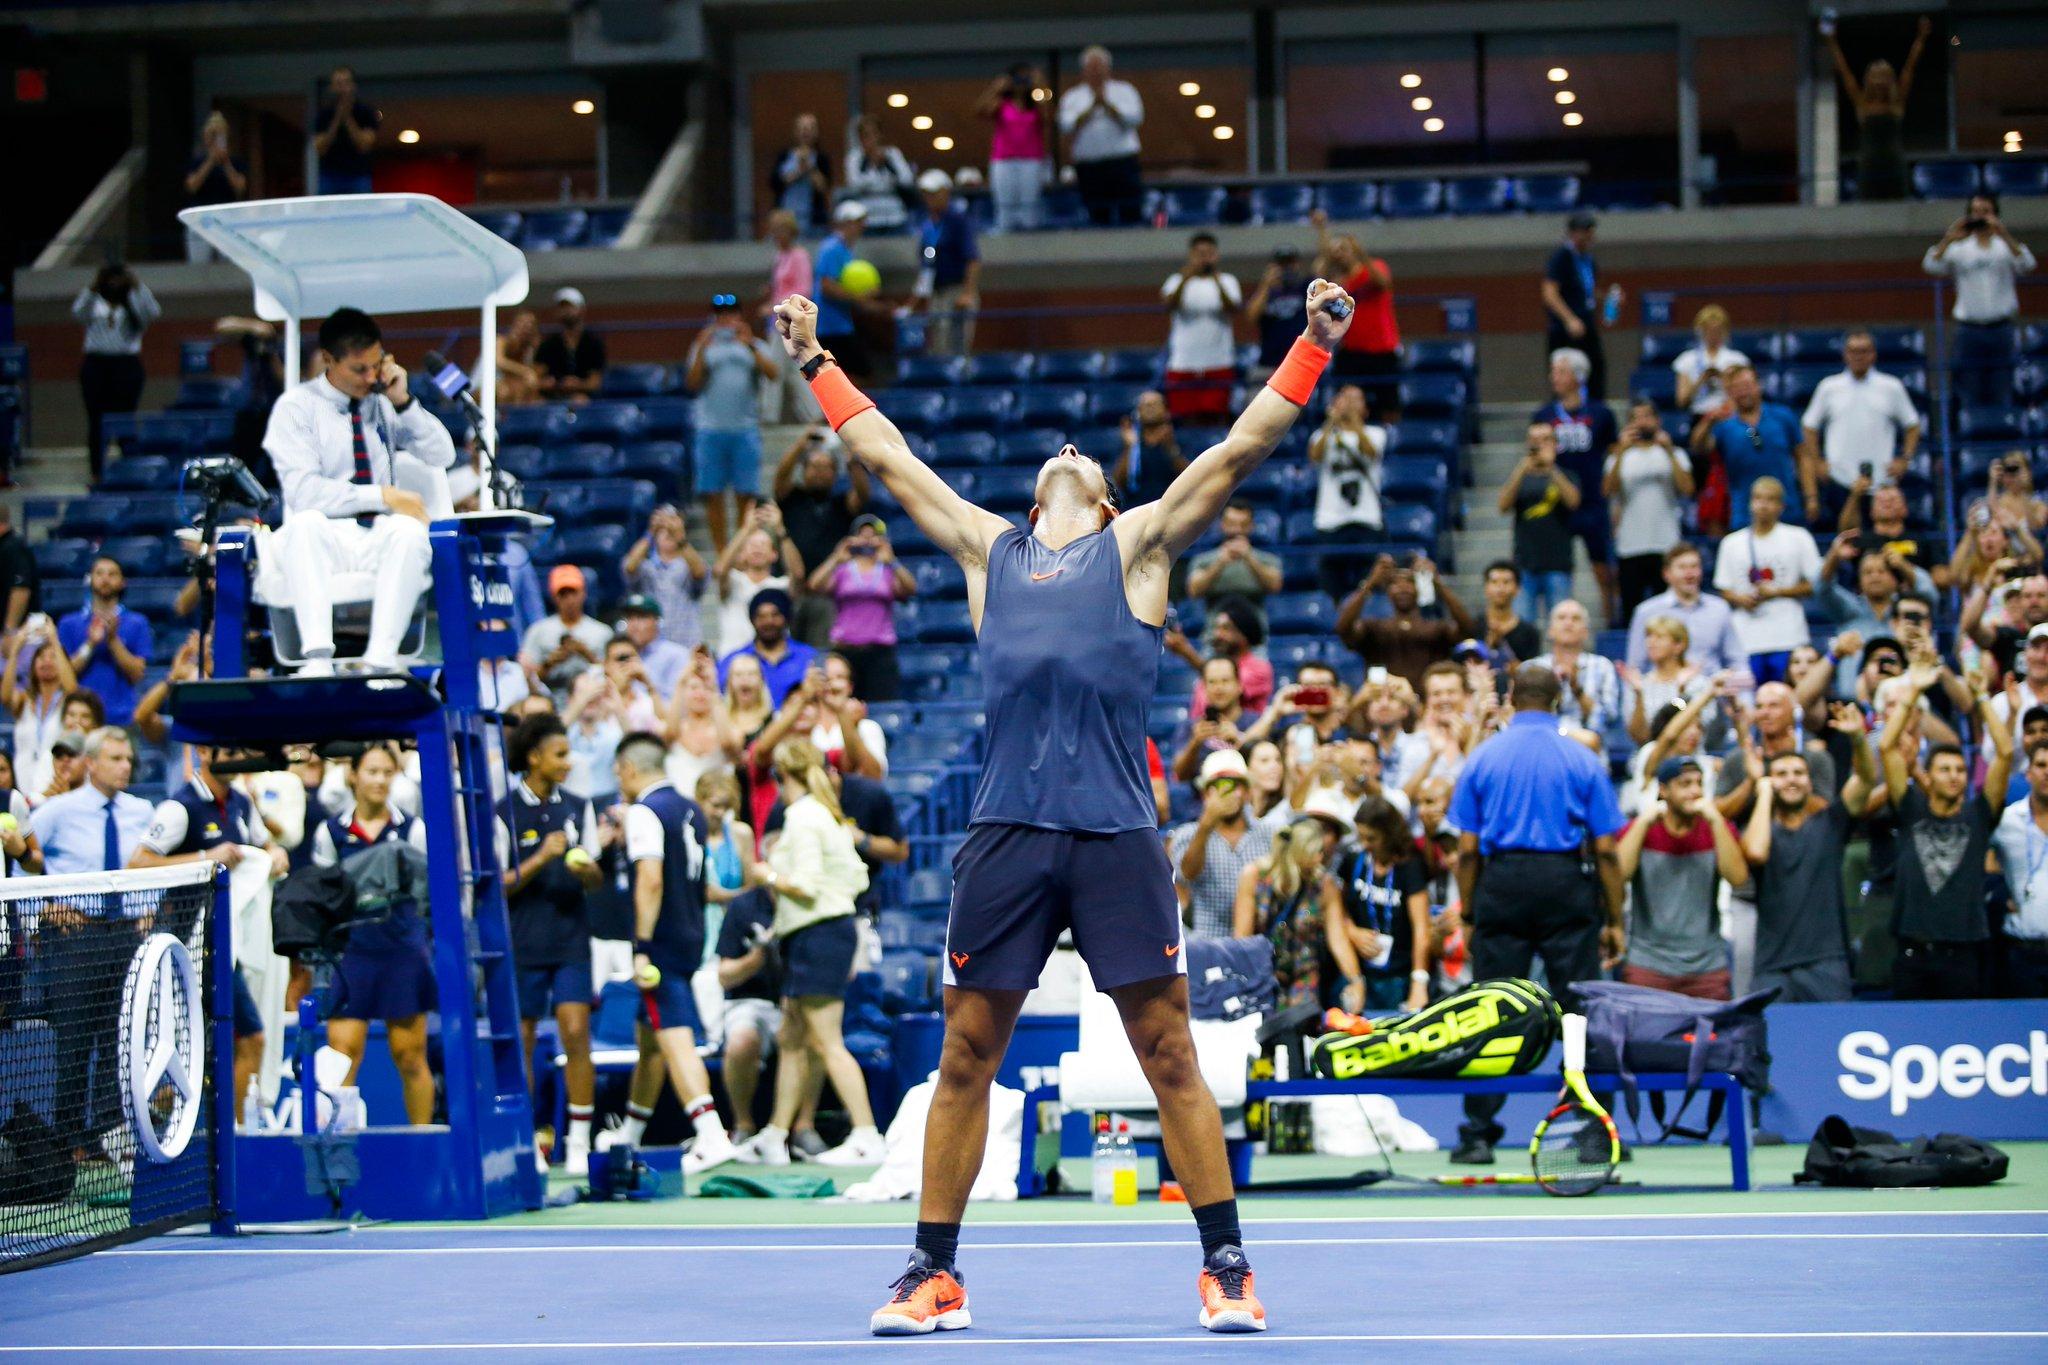 That #FridayFeeling �� ��   Who else is still buzzing from Nadal & Thiem's epic QF clash?! ��♂️  #USOpen @RafaelNadal https://t.co/a4nwHzz9DJ